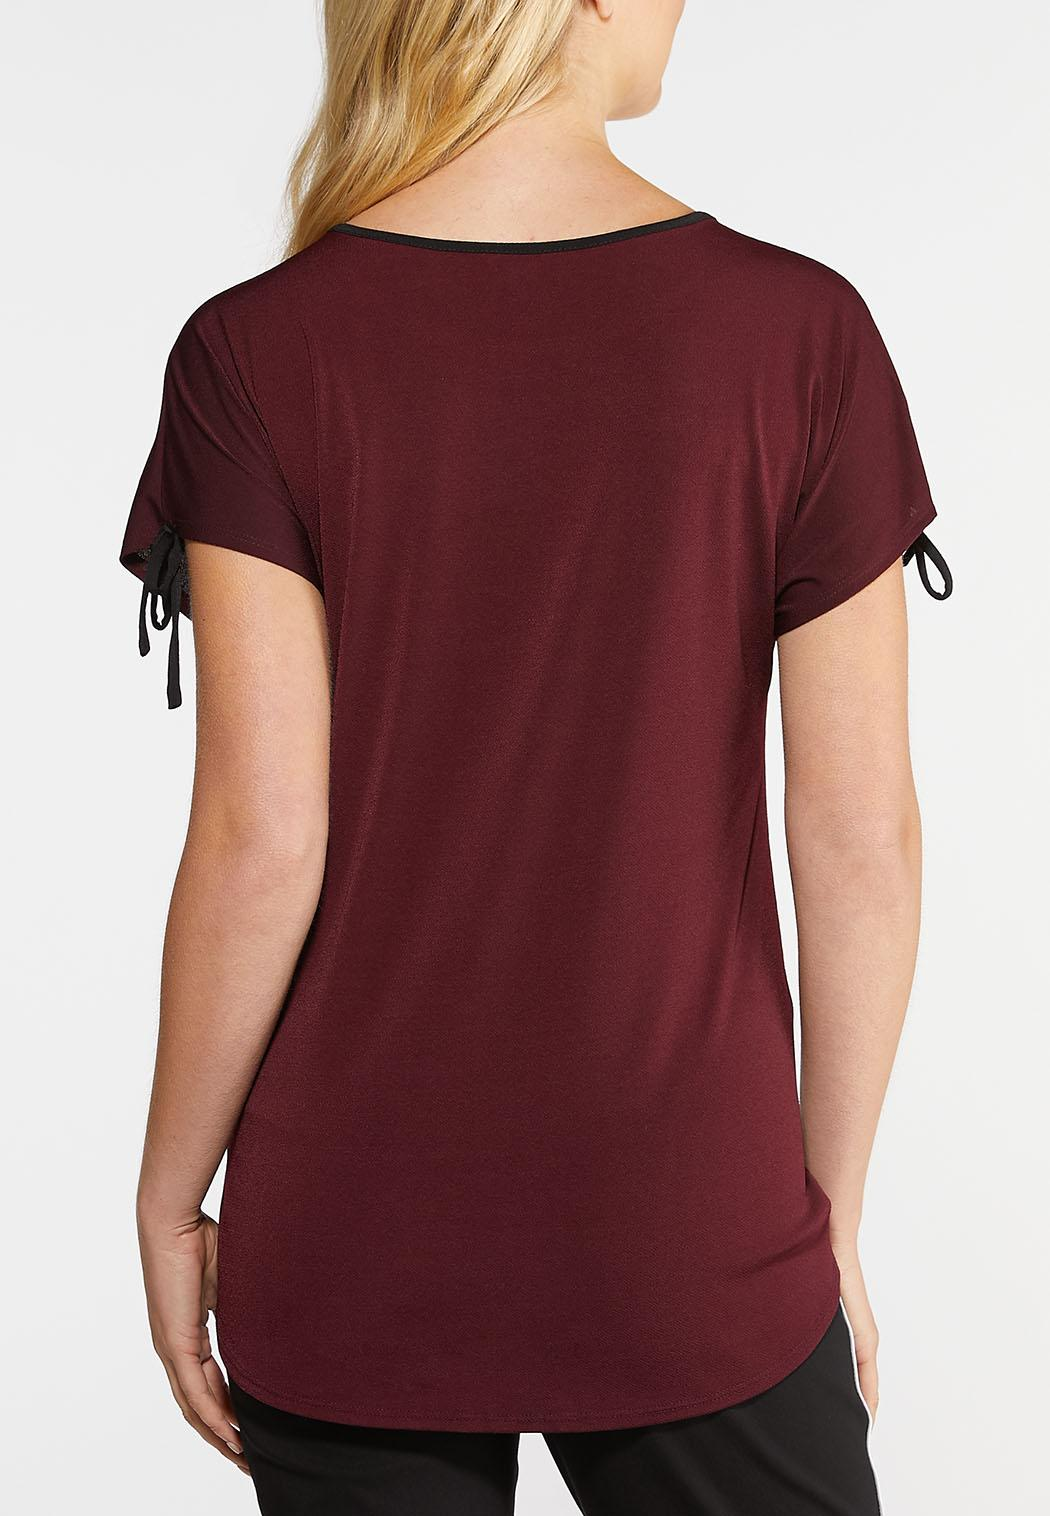 Plus Size Tie Sleeve Wine Top (Item #43945959)